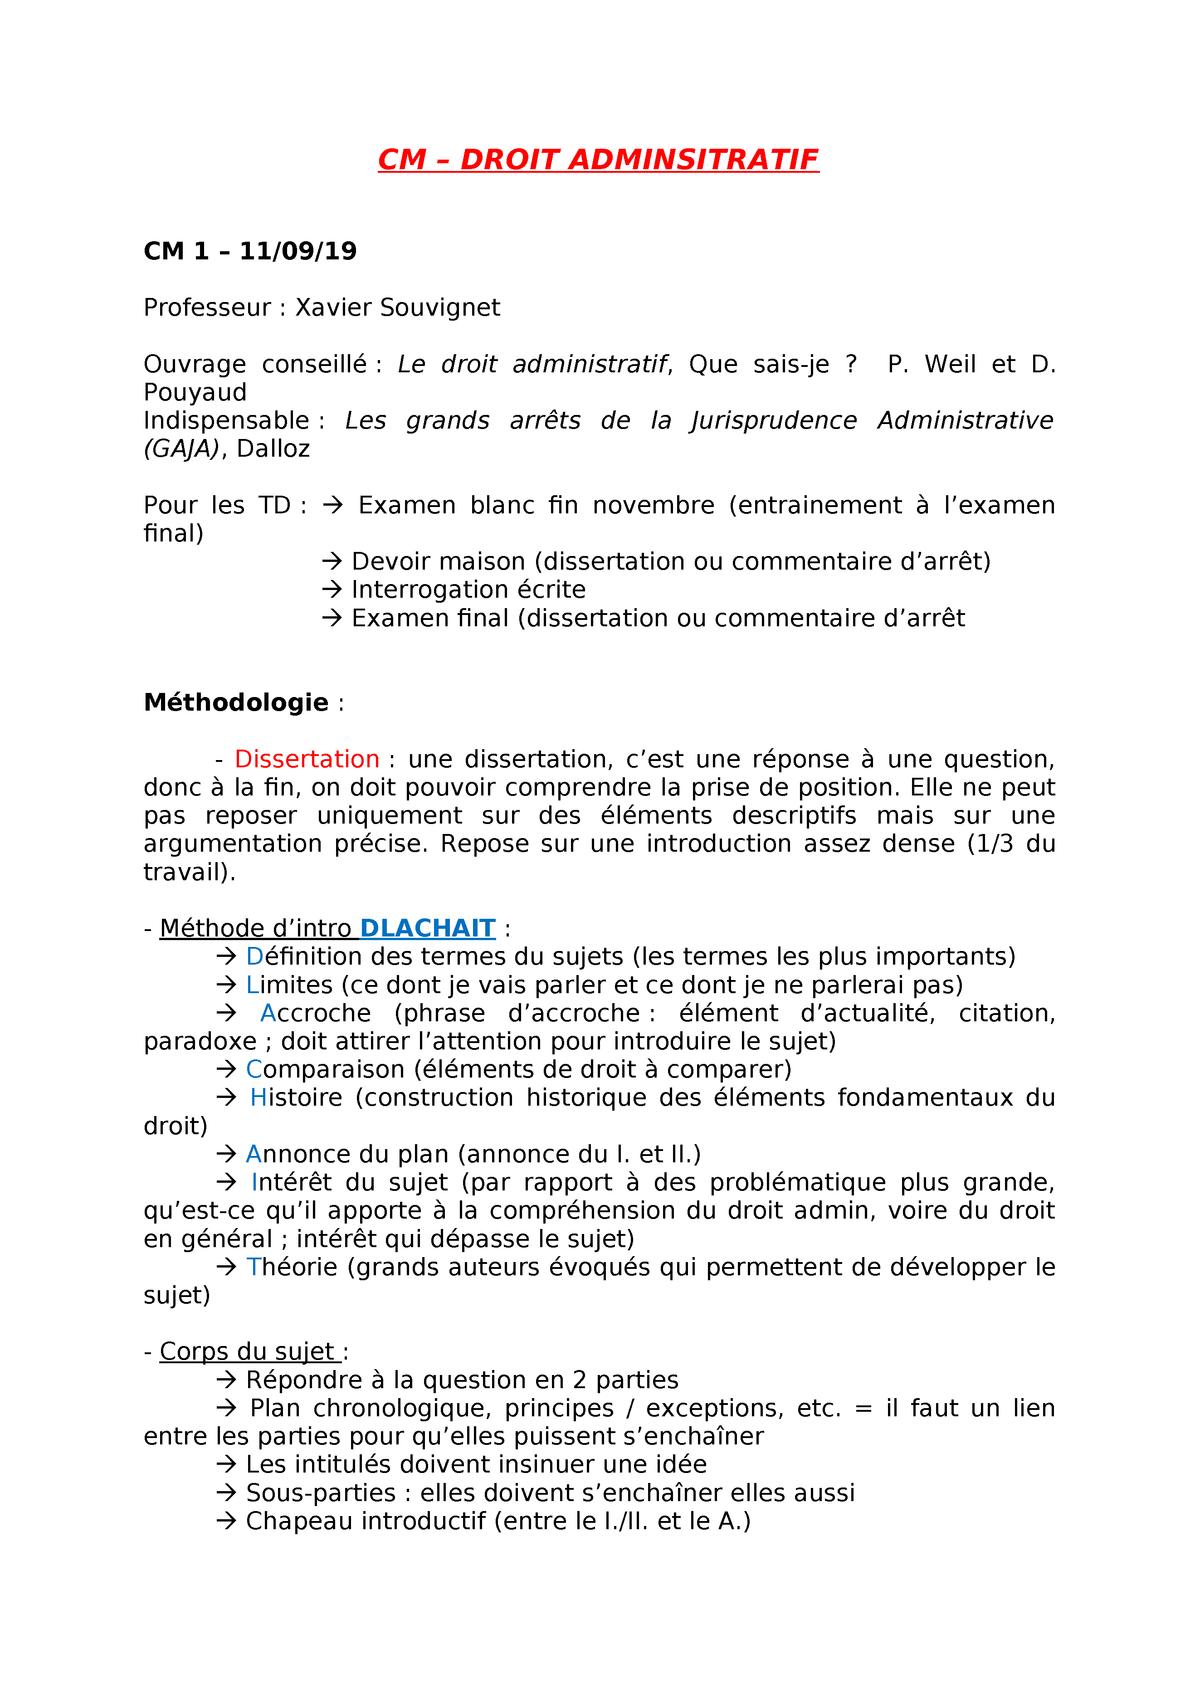 Dissertation droit administratif principe lgalit